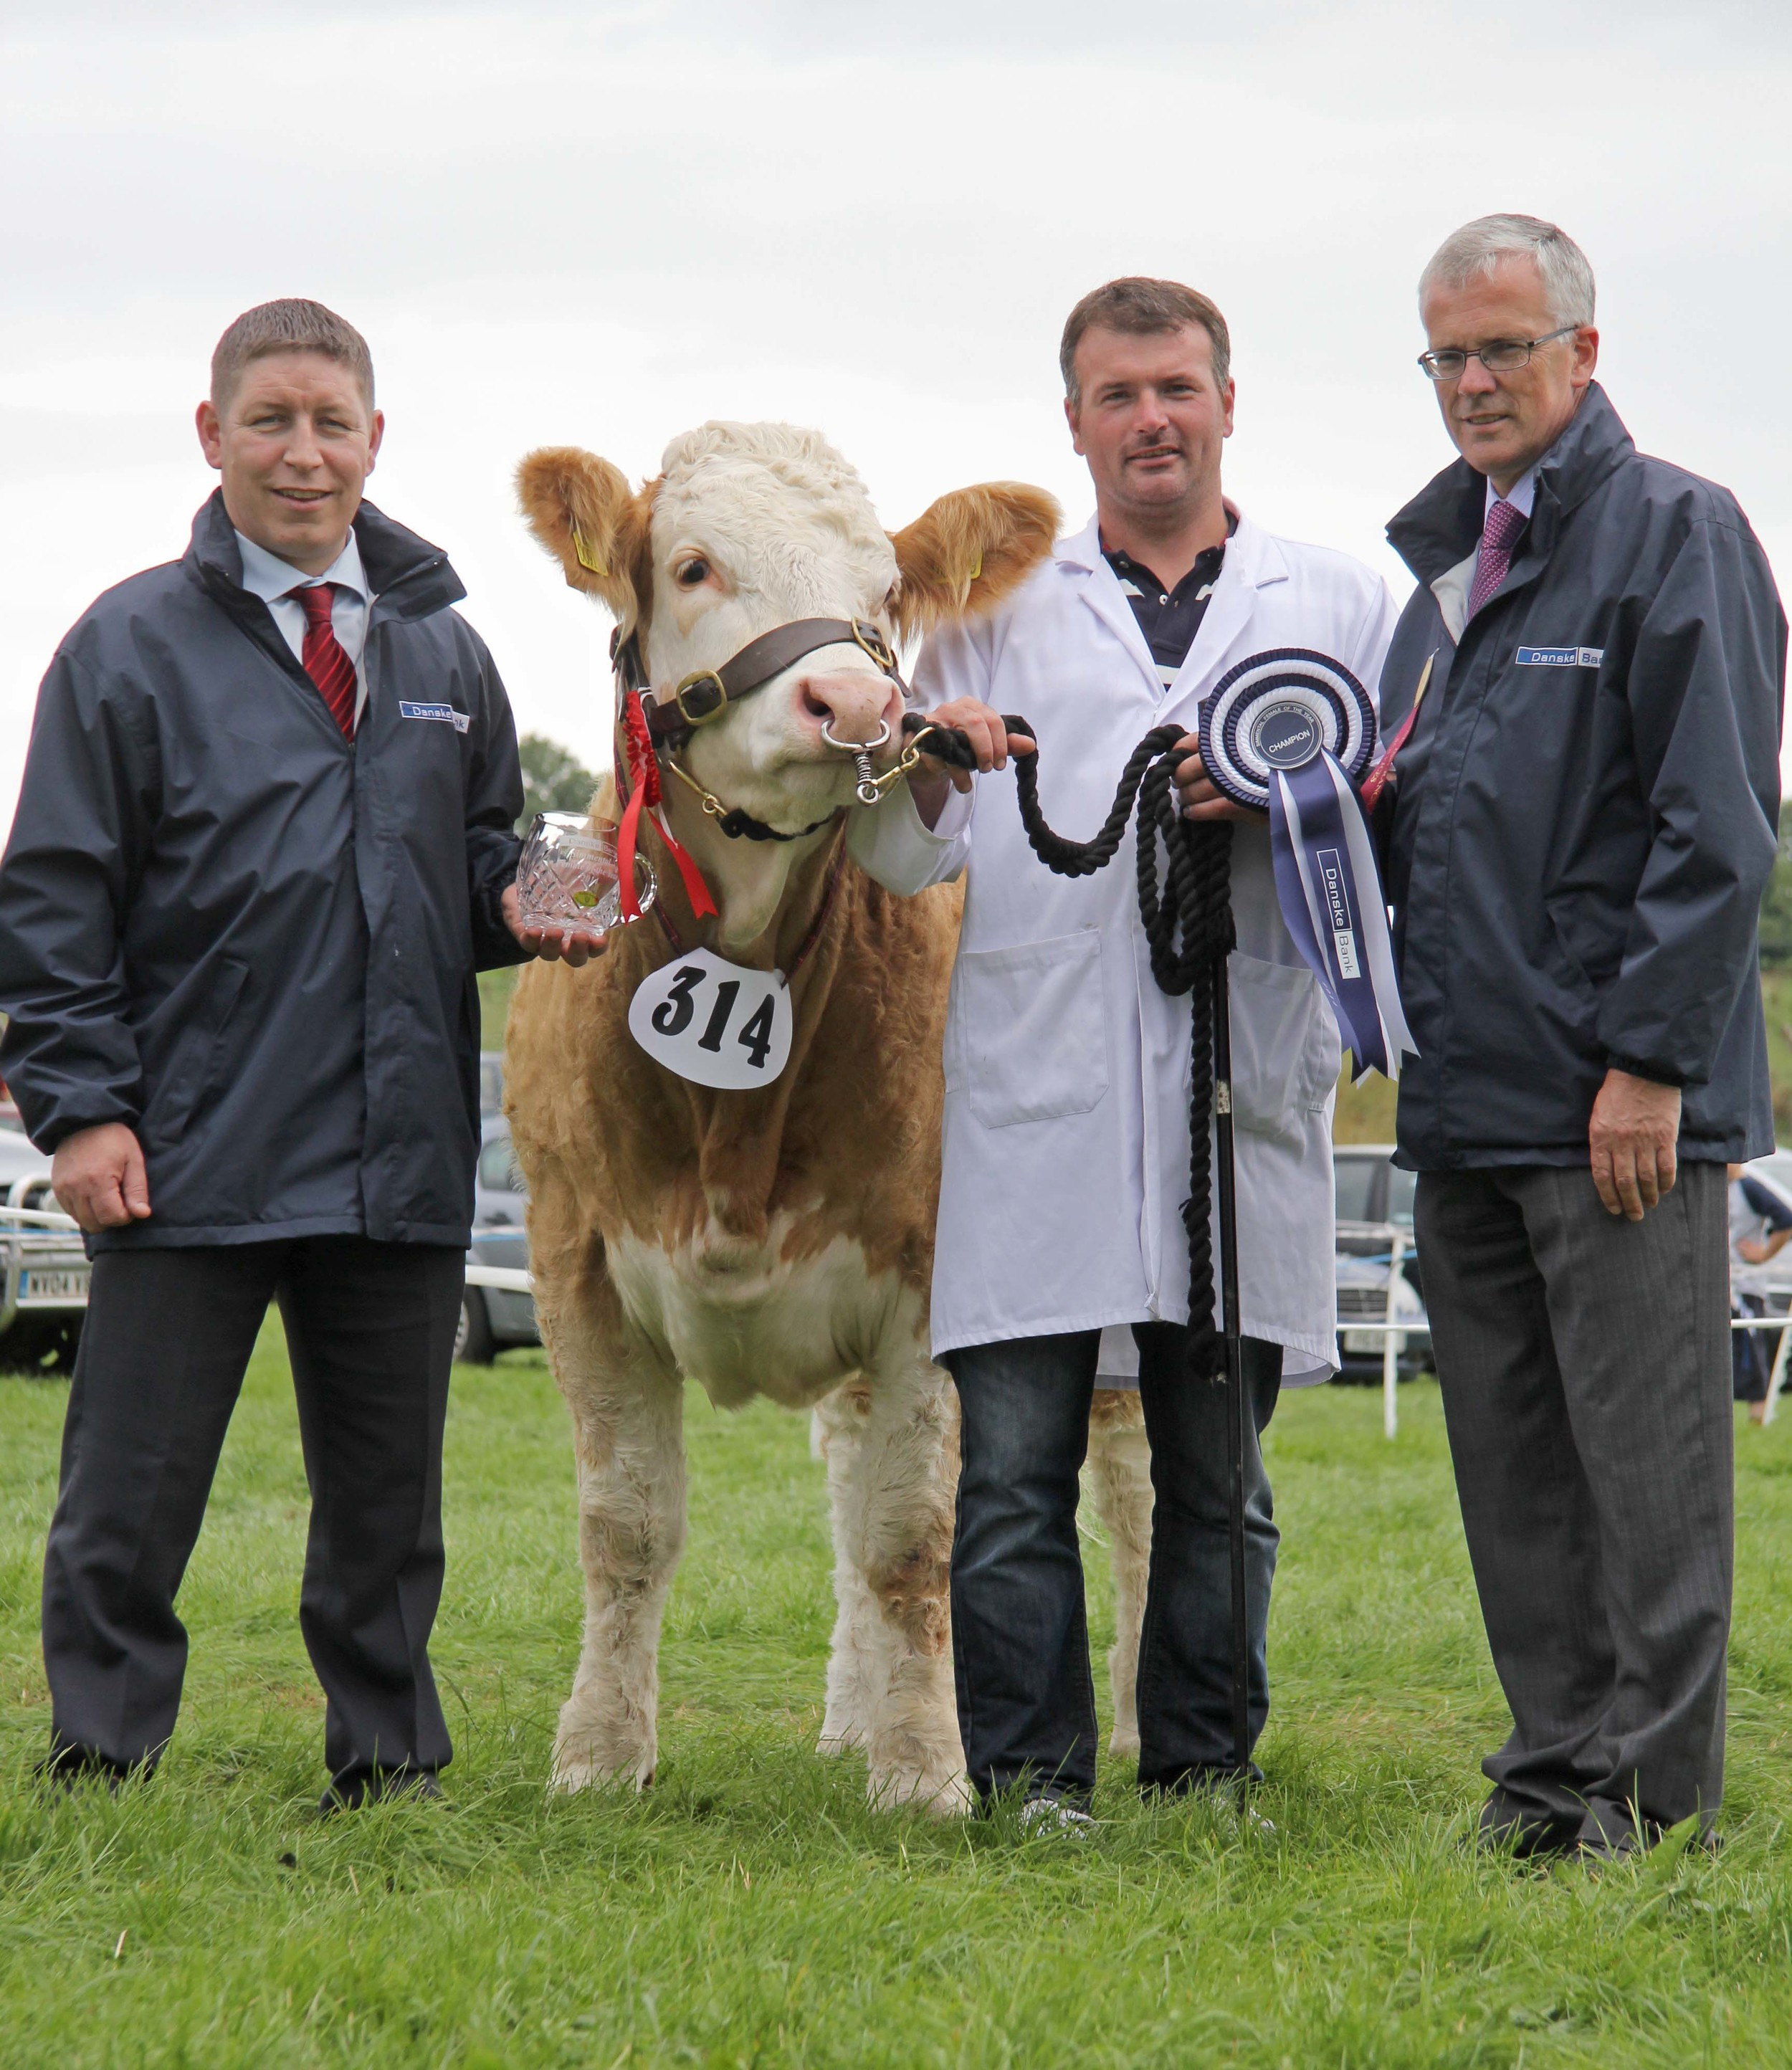 Danske Bank Simmental Female of the Year was Ballinlare Farm Empress shown by Alan Wilson, Newry. Pictured at the Enniskillen Show presentation are Rodney Brown and John Henning, Danske Bank, sponsors.